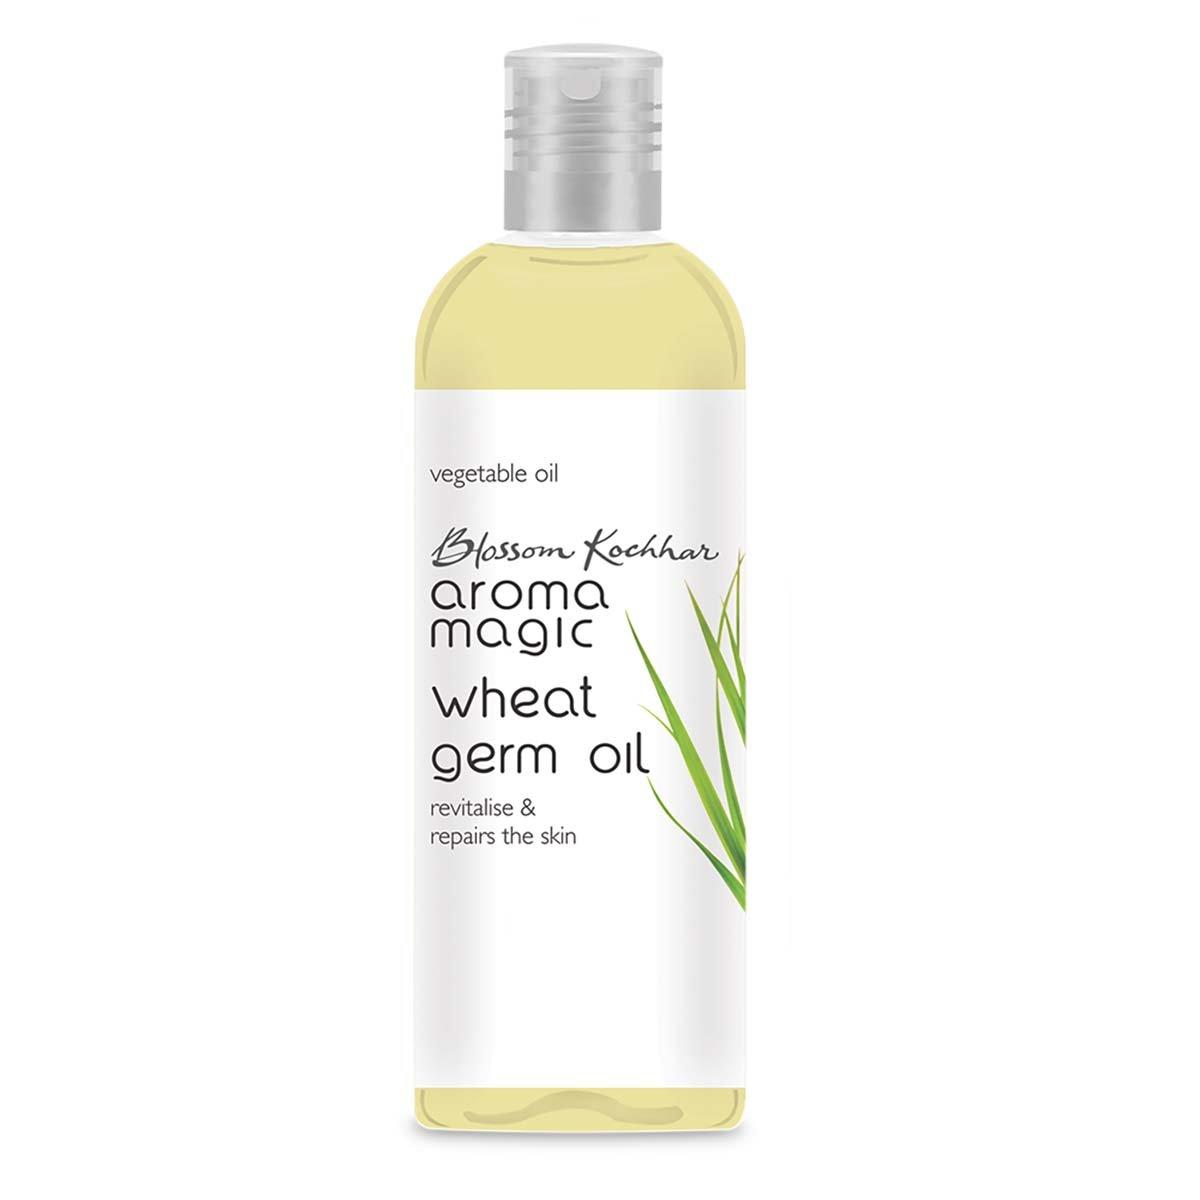 Aroma_Magic_Wheat_Germ_Oil_100_ml